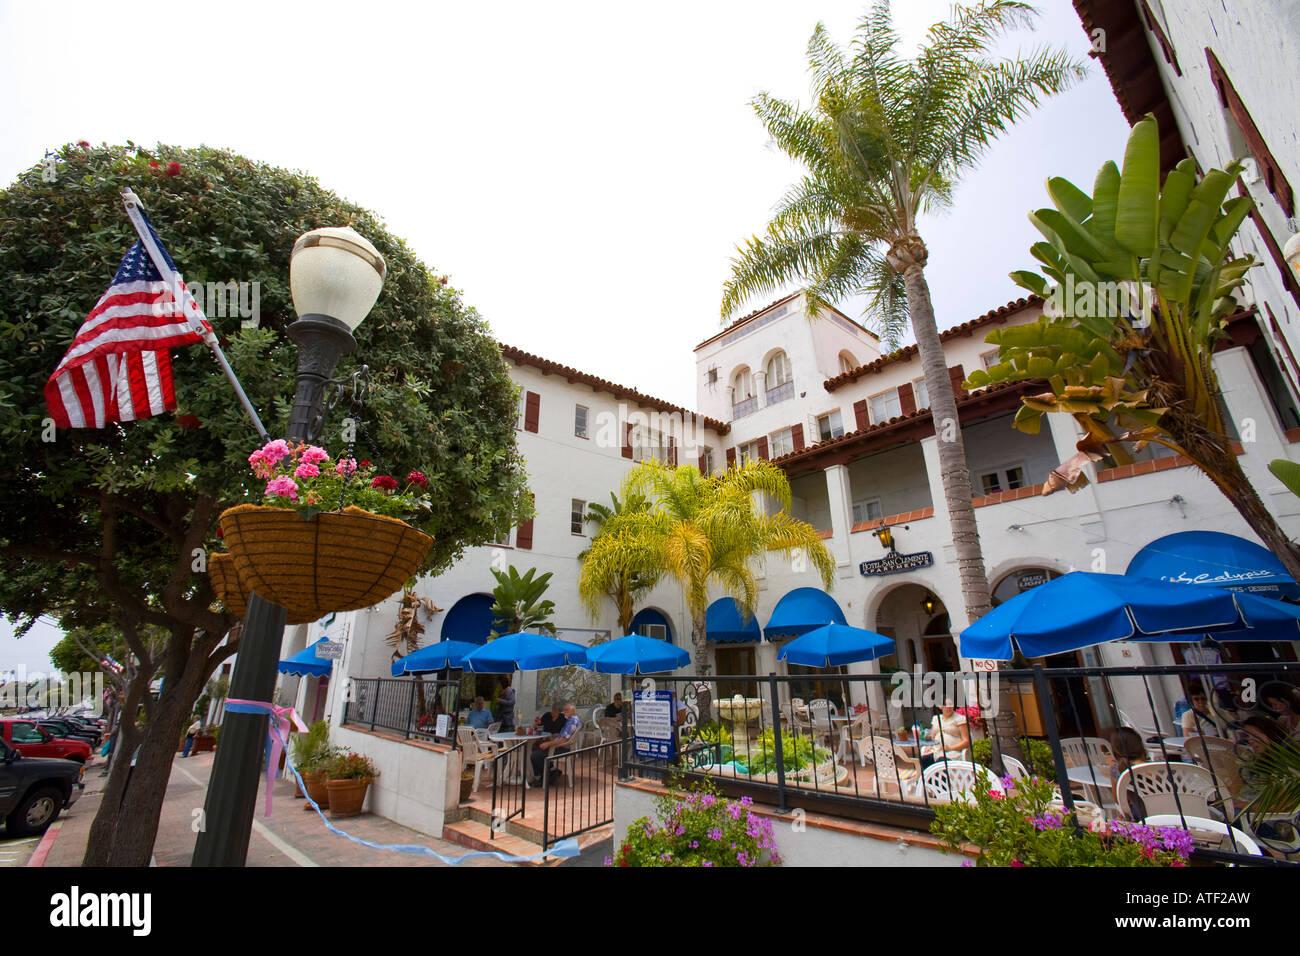 hotel san clemente, avenida del mar, san clemente, orange county